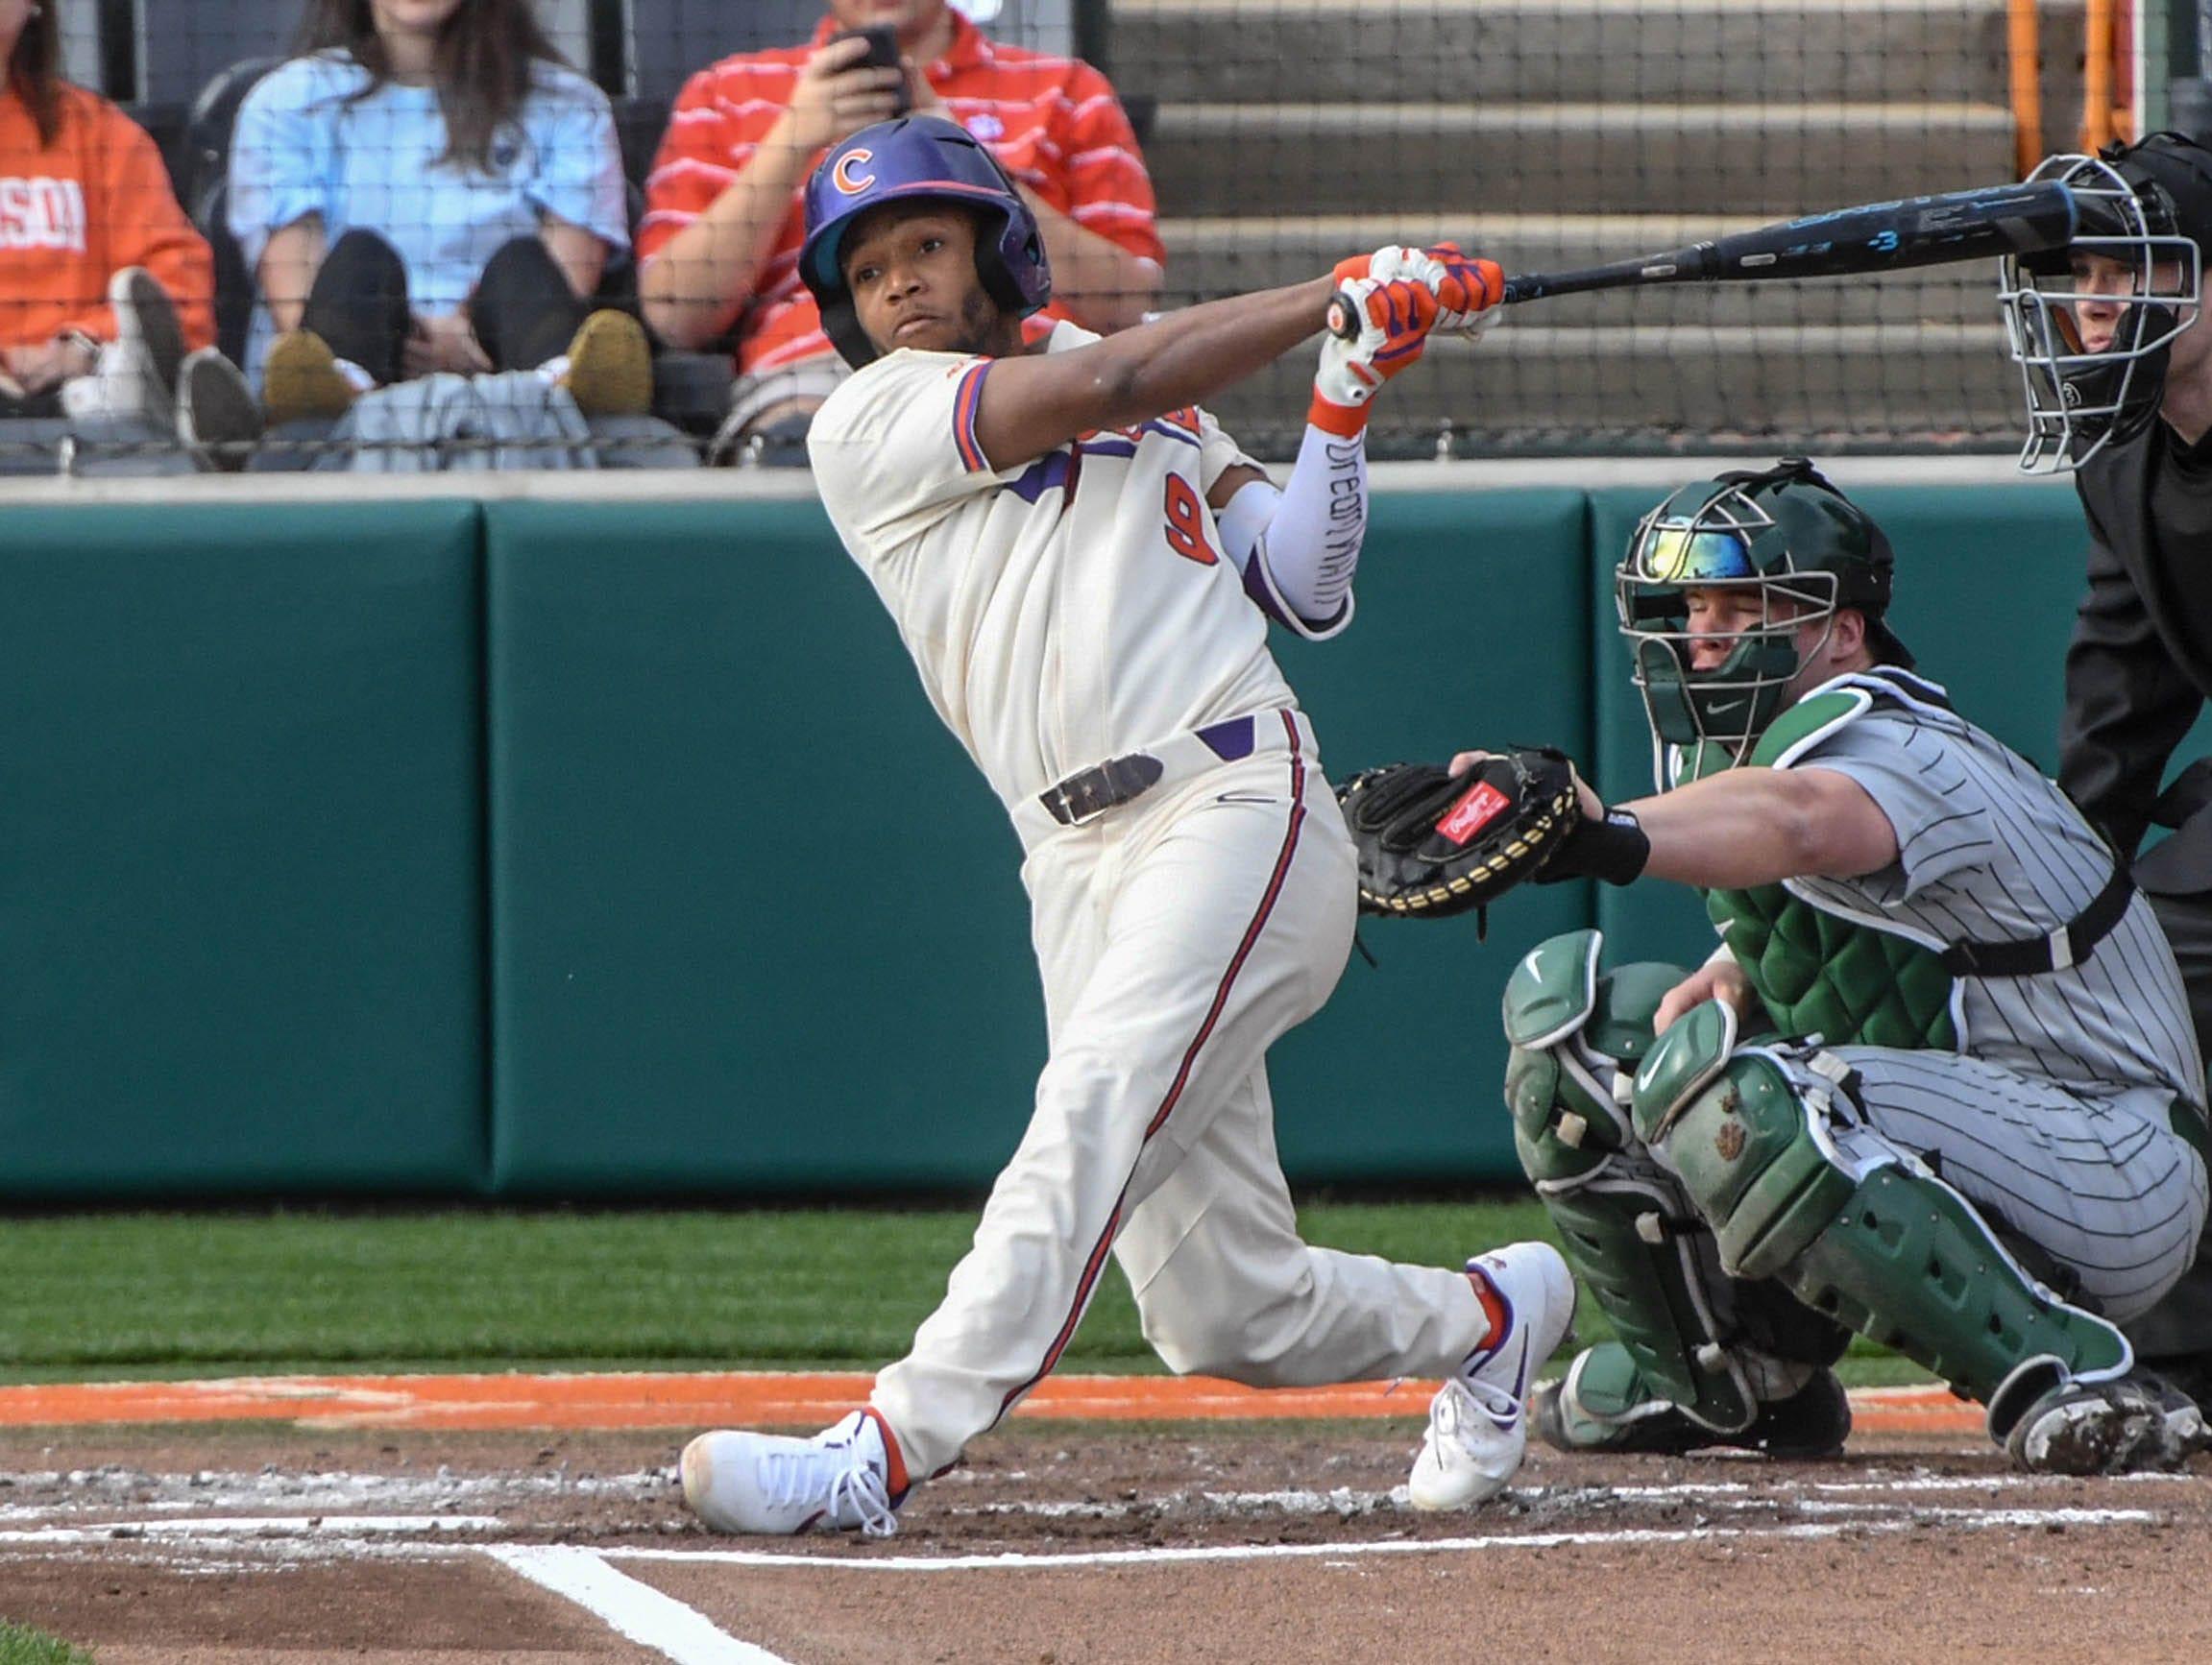 Clemson infielder Jordan Greene(9) hits a home run against Charlotte during the bottom of the second inning at Doug Kingsmore Stadium in Clemson Monday, February 18, 2019.